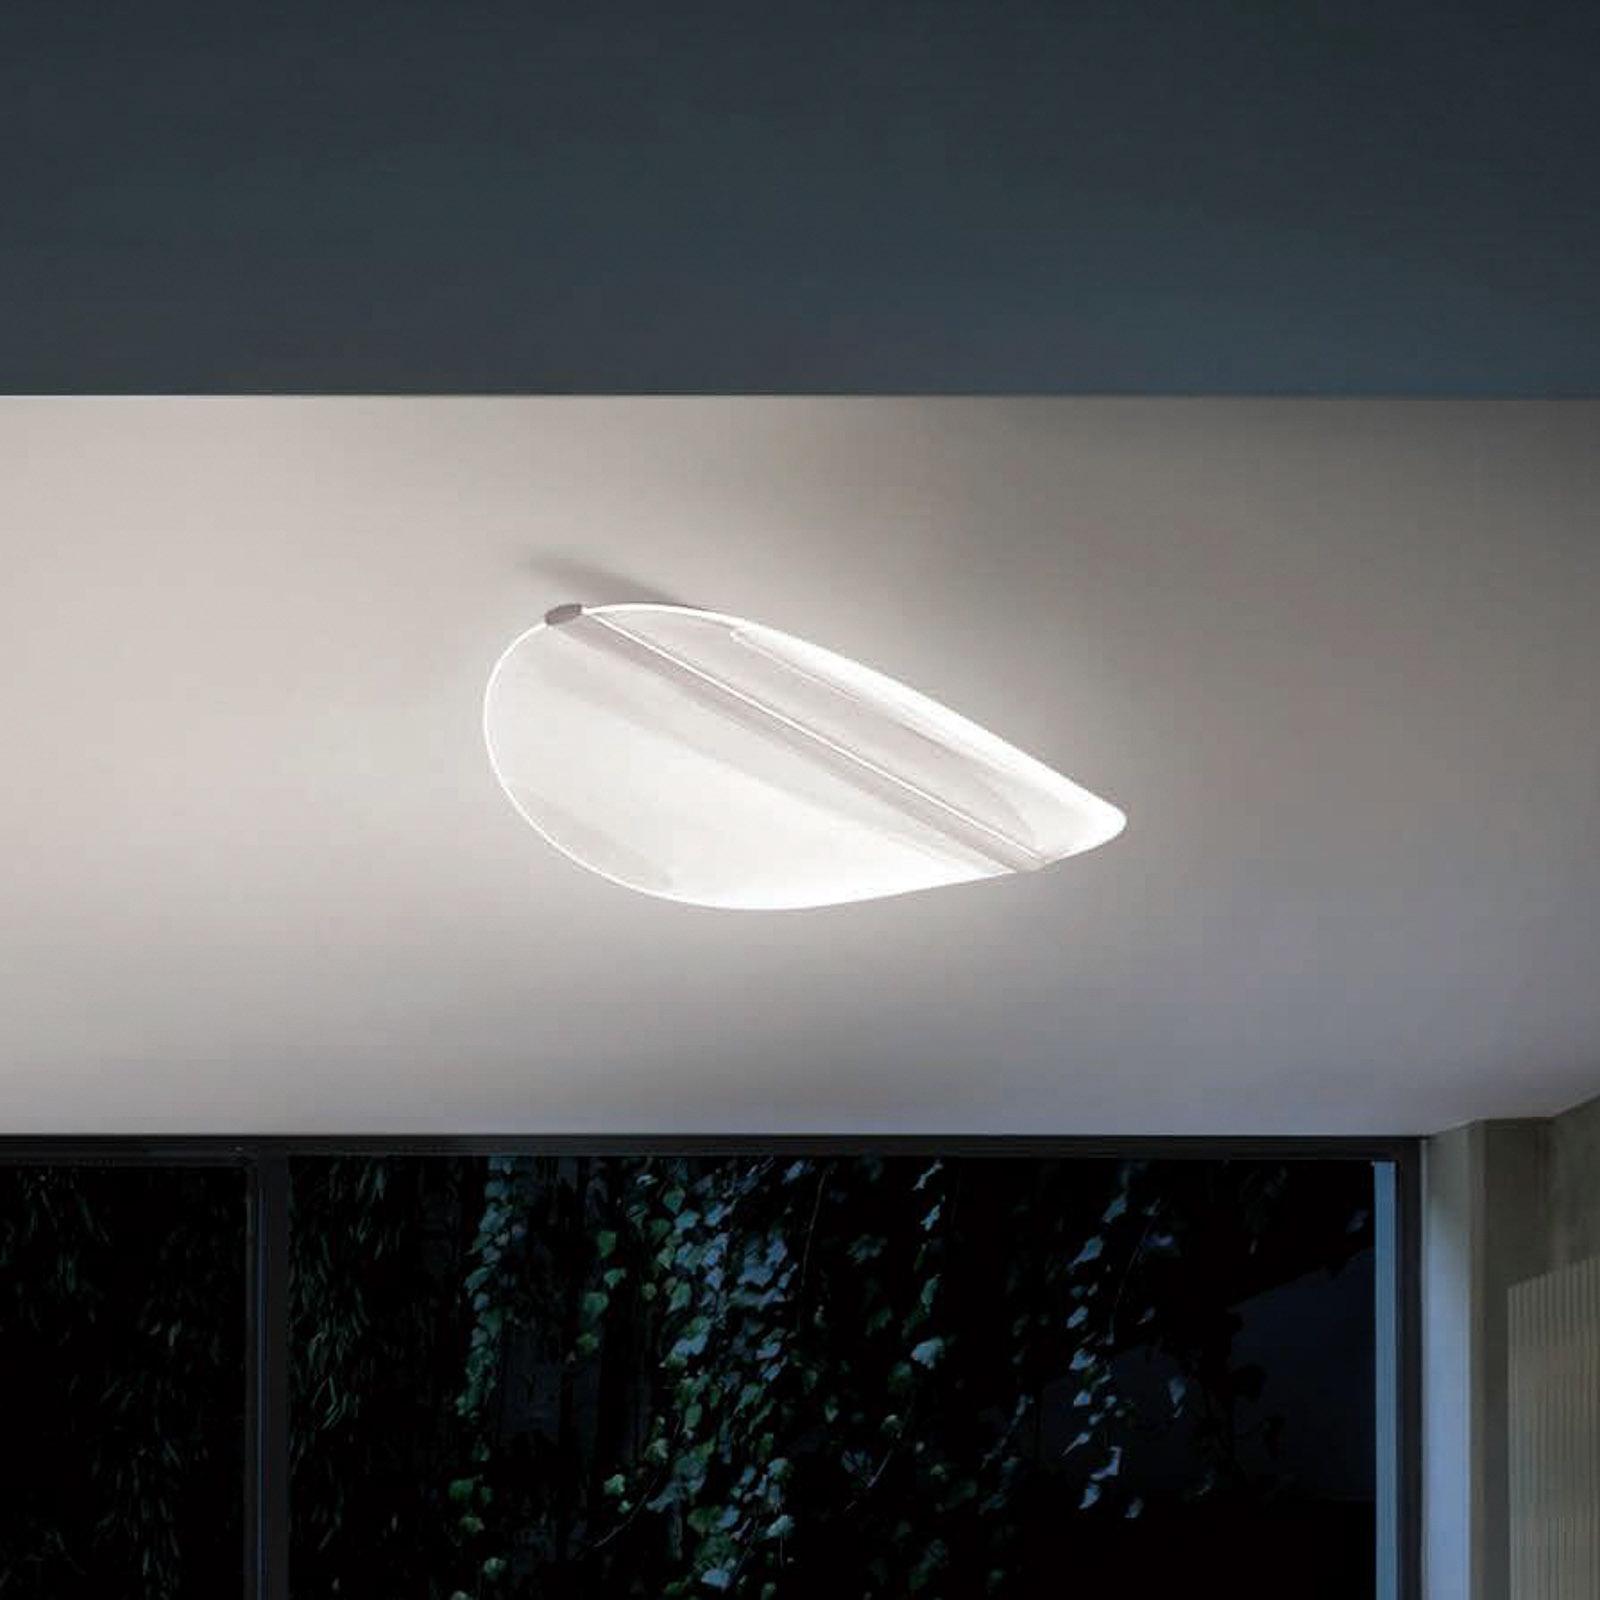 Lampa sufitowa LED Diphy, 54 cm